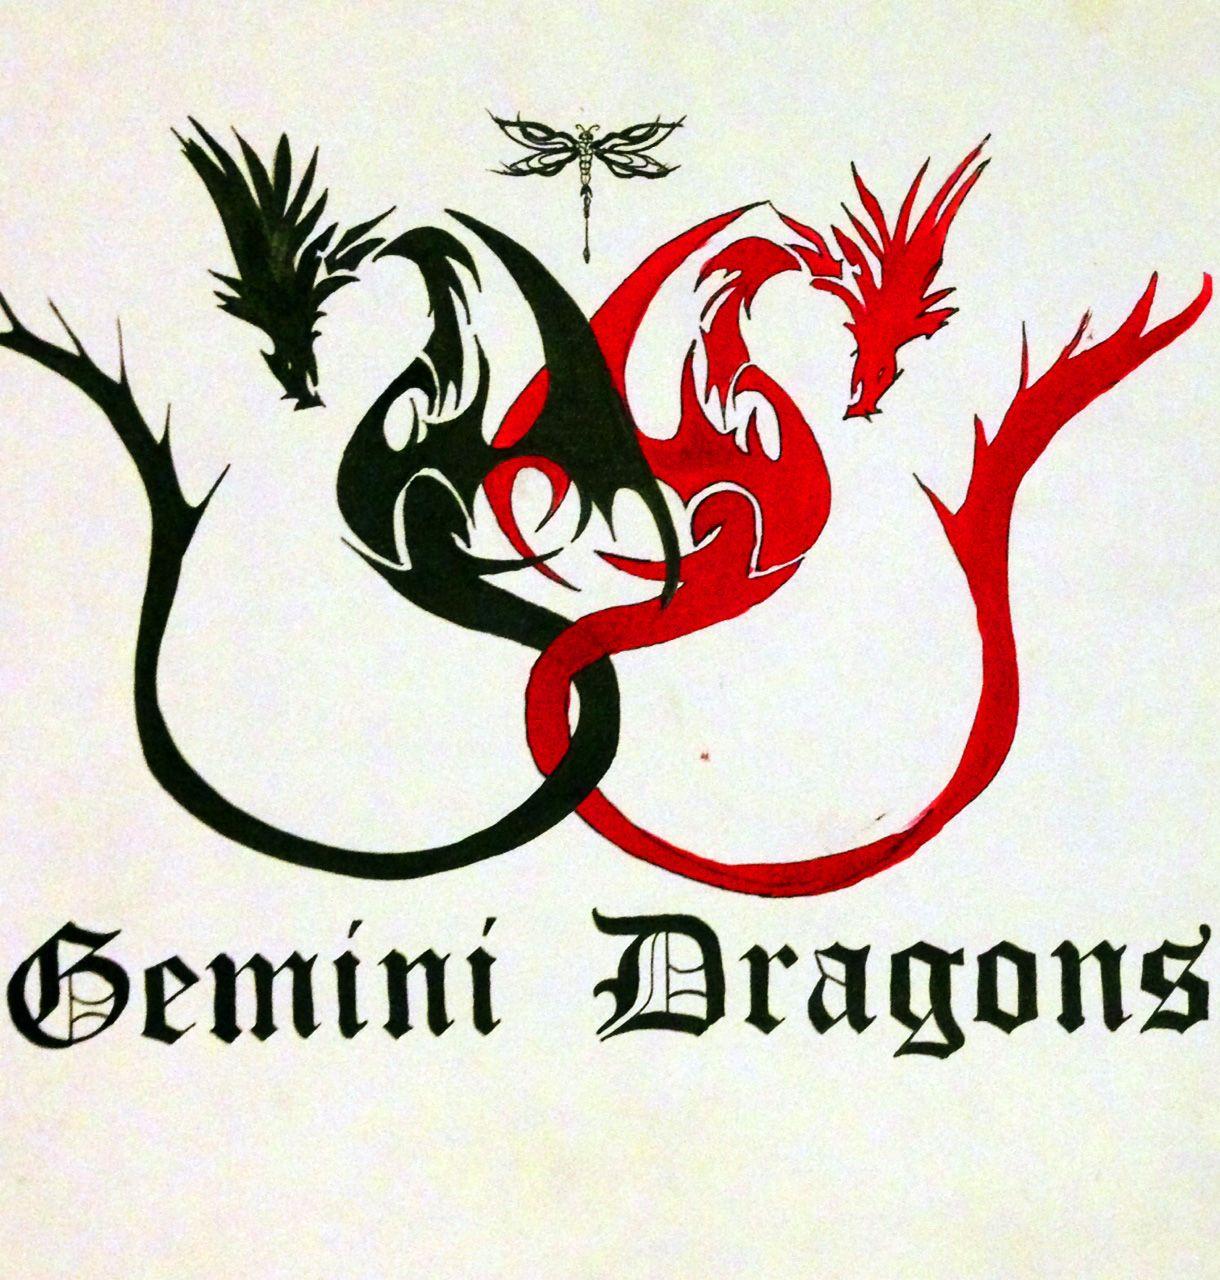 Gemini Dragons Tattoo Design Gemini Zodiac Tattoos Gemini Tattoo Gemini Tattoo Designs